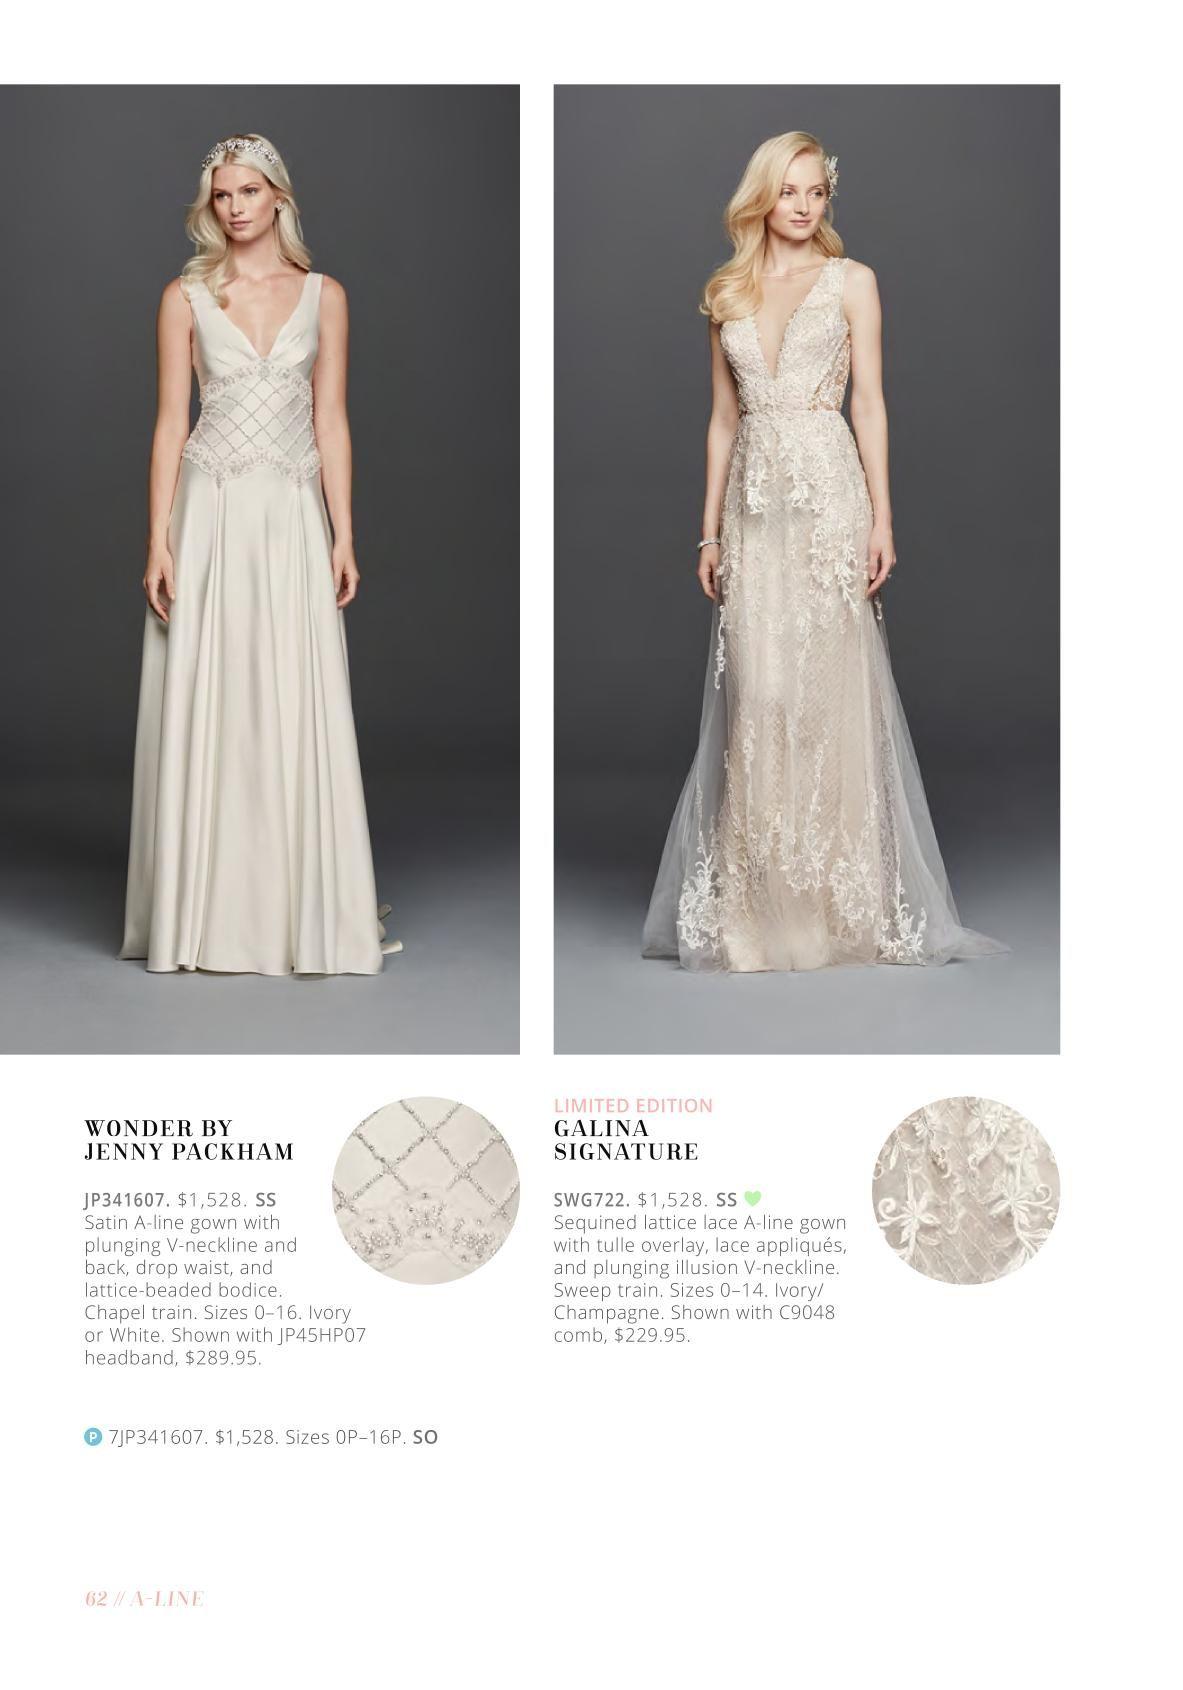 f5b41463facf David's Bridal Online Catalog | Bridal | Wedding dresses, Formal ...